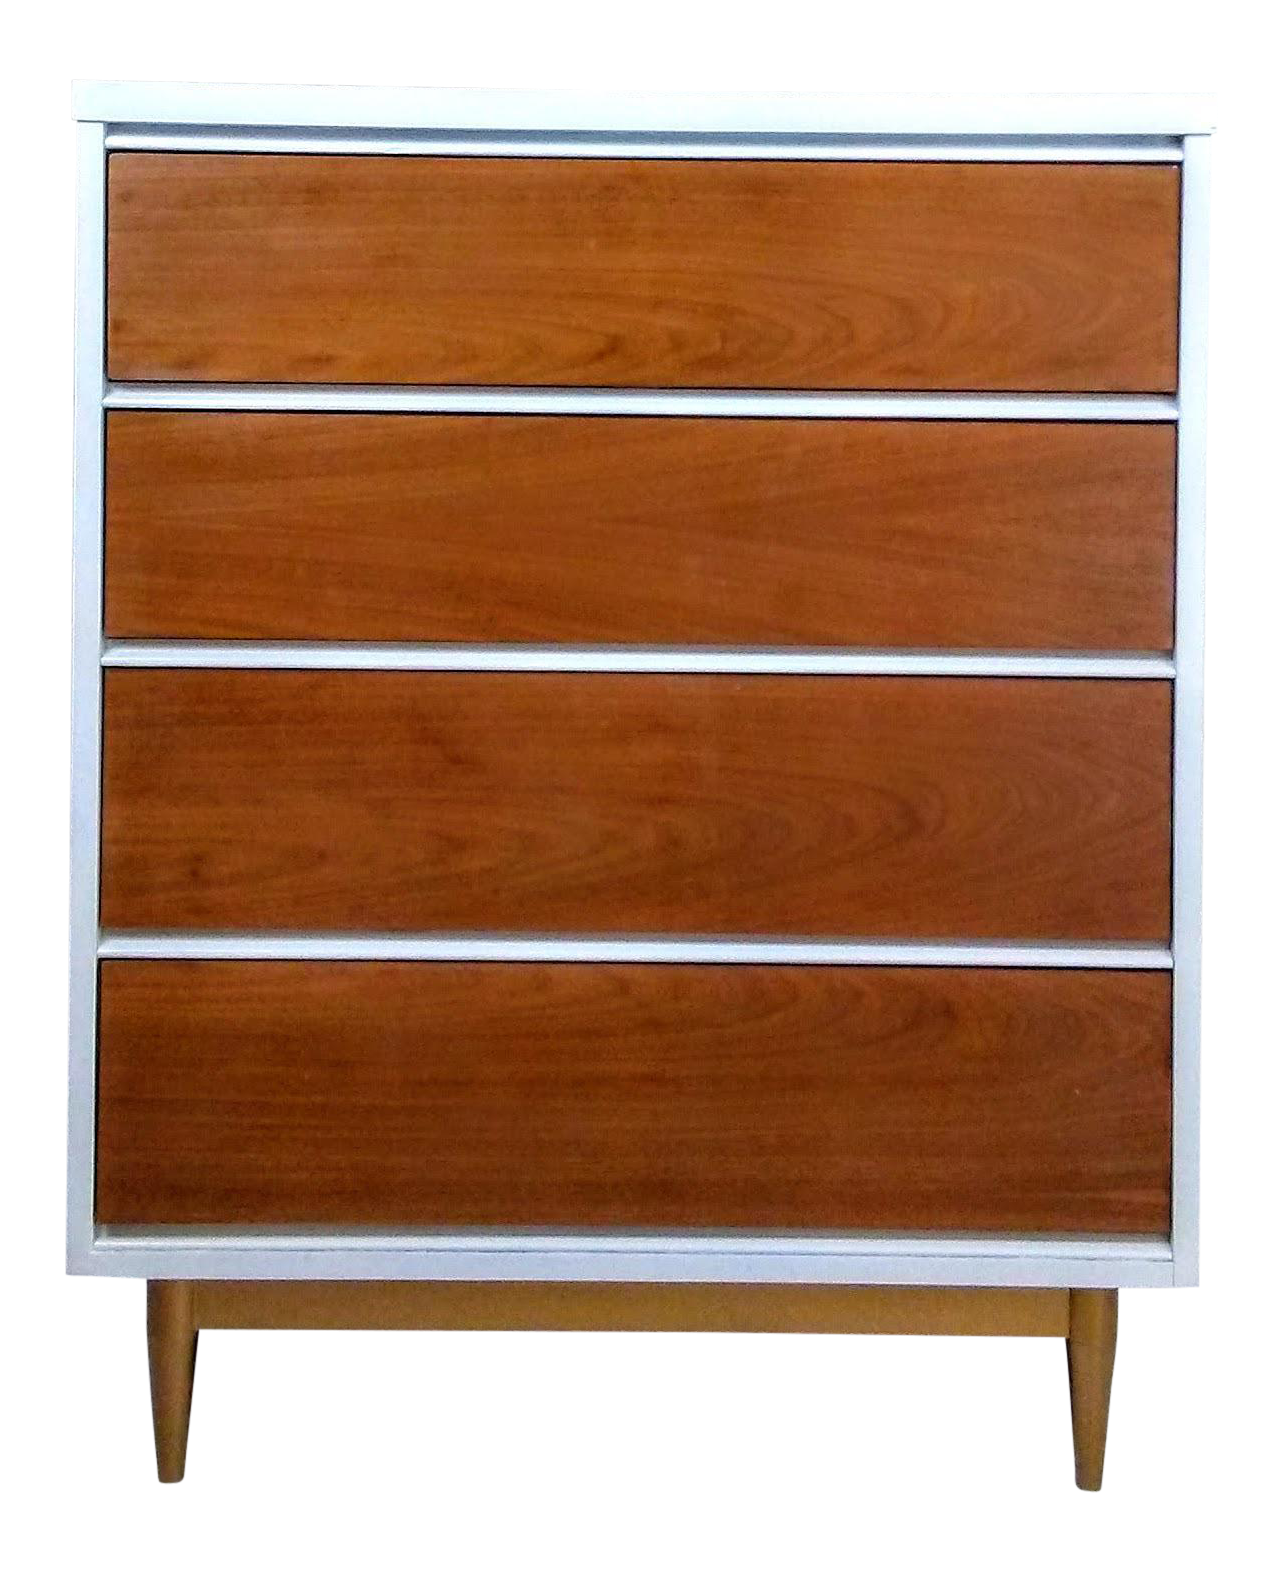 vtg 1940 50s simmons furniture metal medical. Vintage Mid-Century Modern Dresser White Industrial Loft Minimal Bohemian Furniture Retro Vtg 1940 50s Simmons Metal Medical N